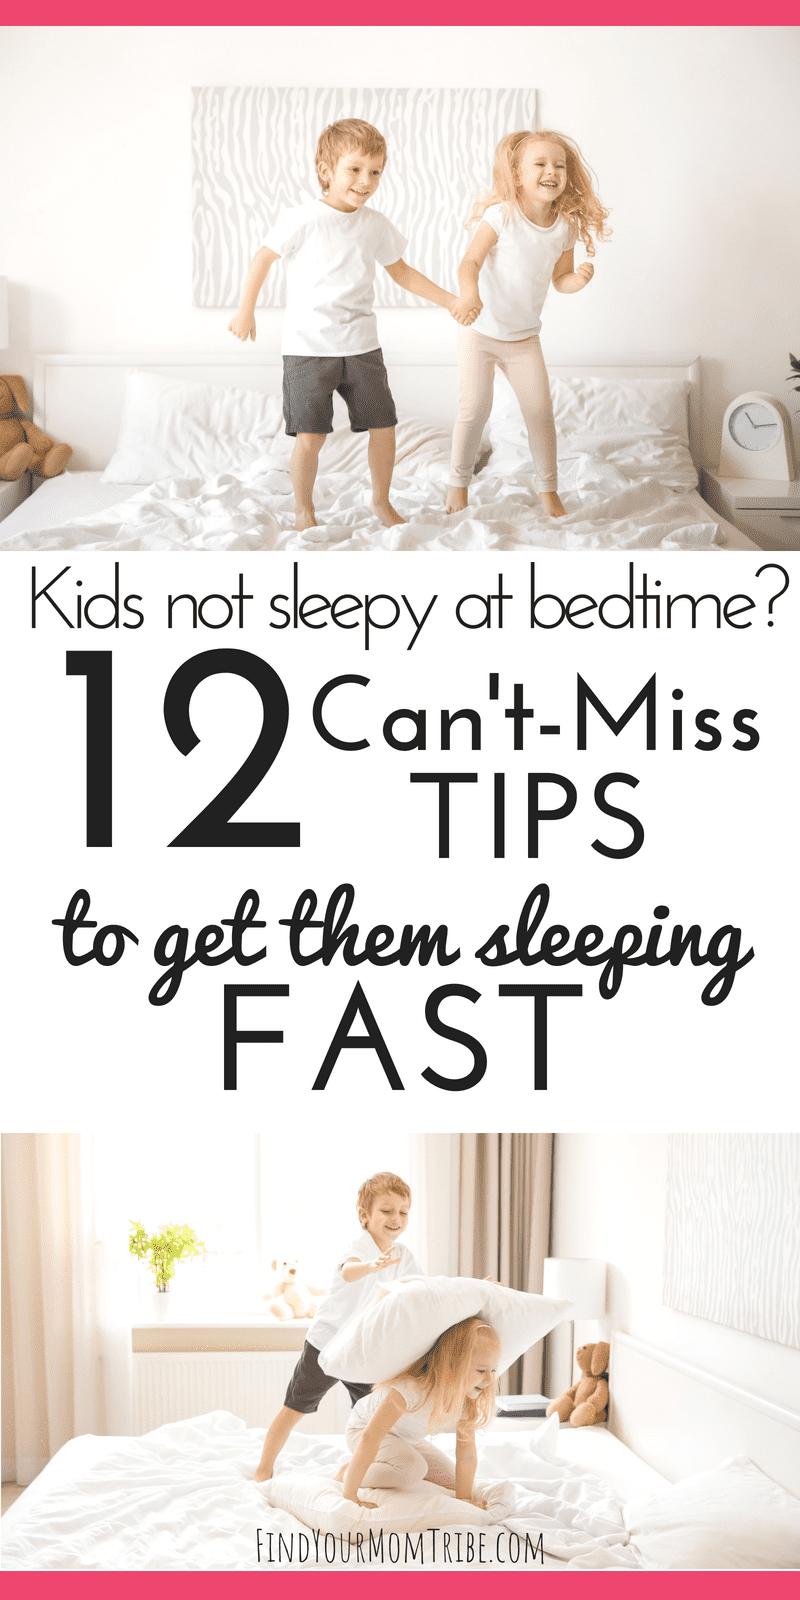 kids not sleepy at bedtime